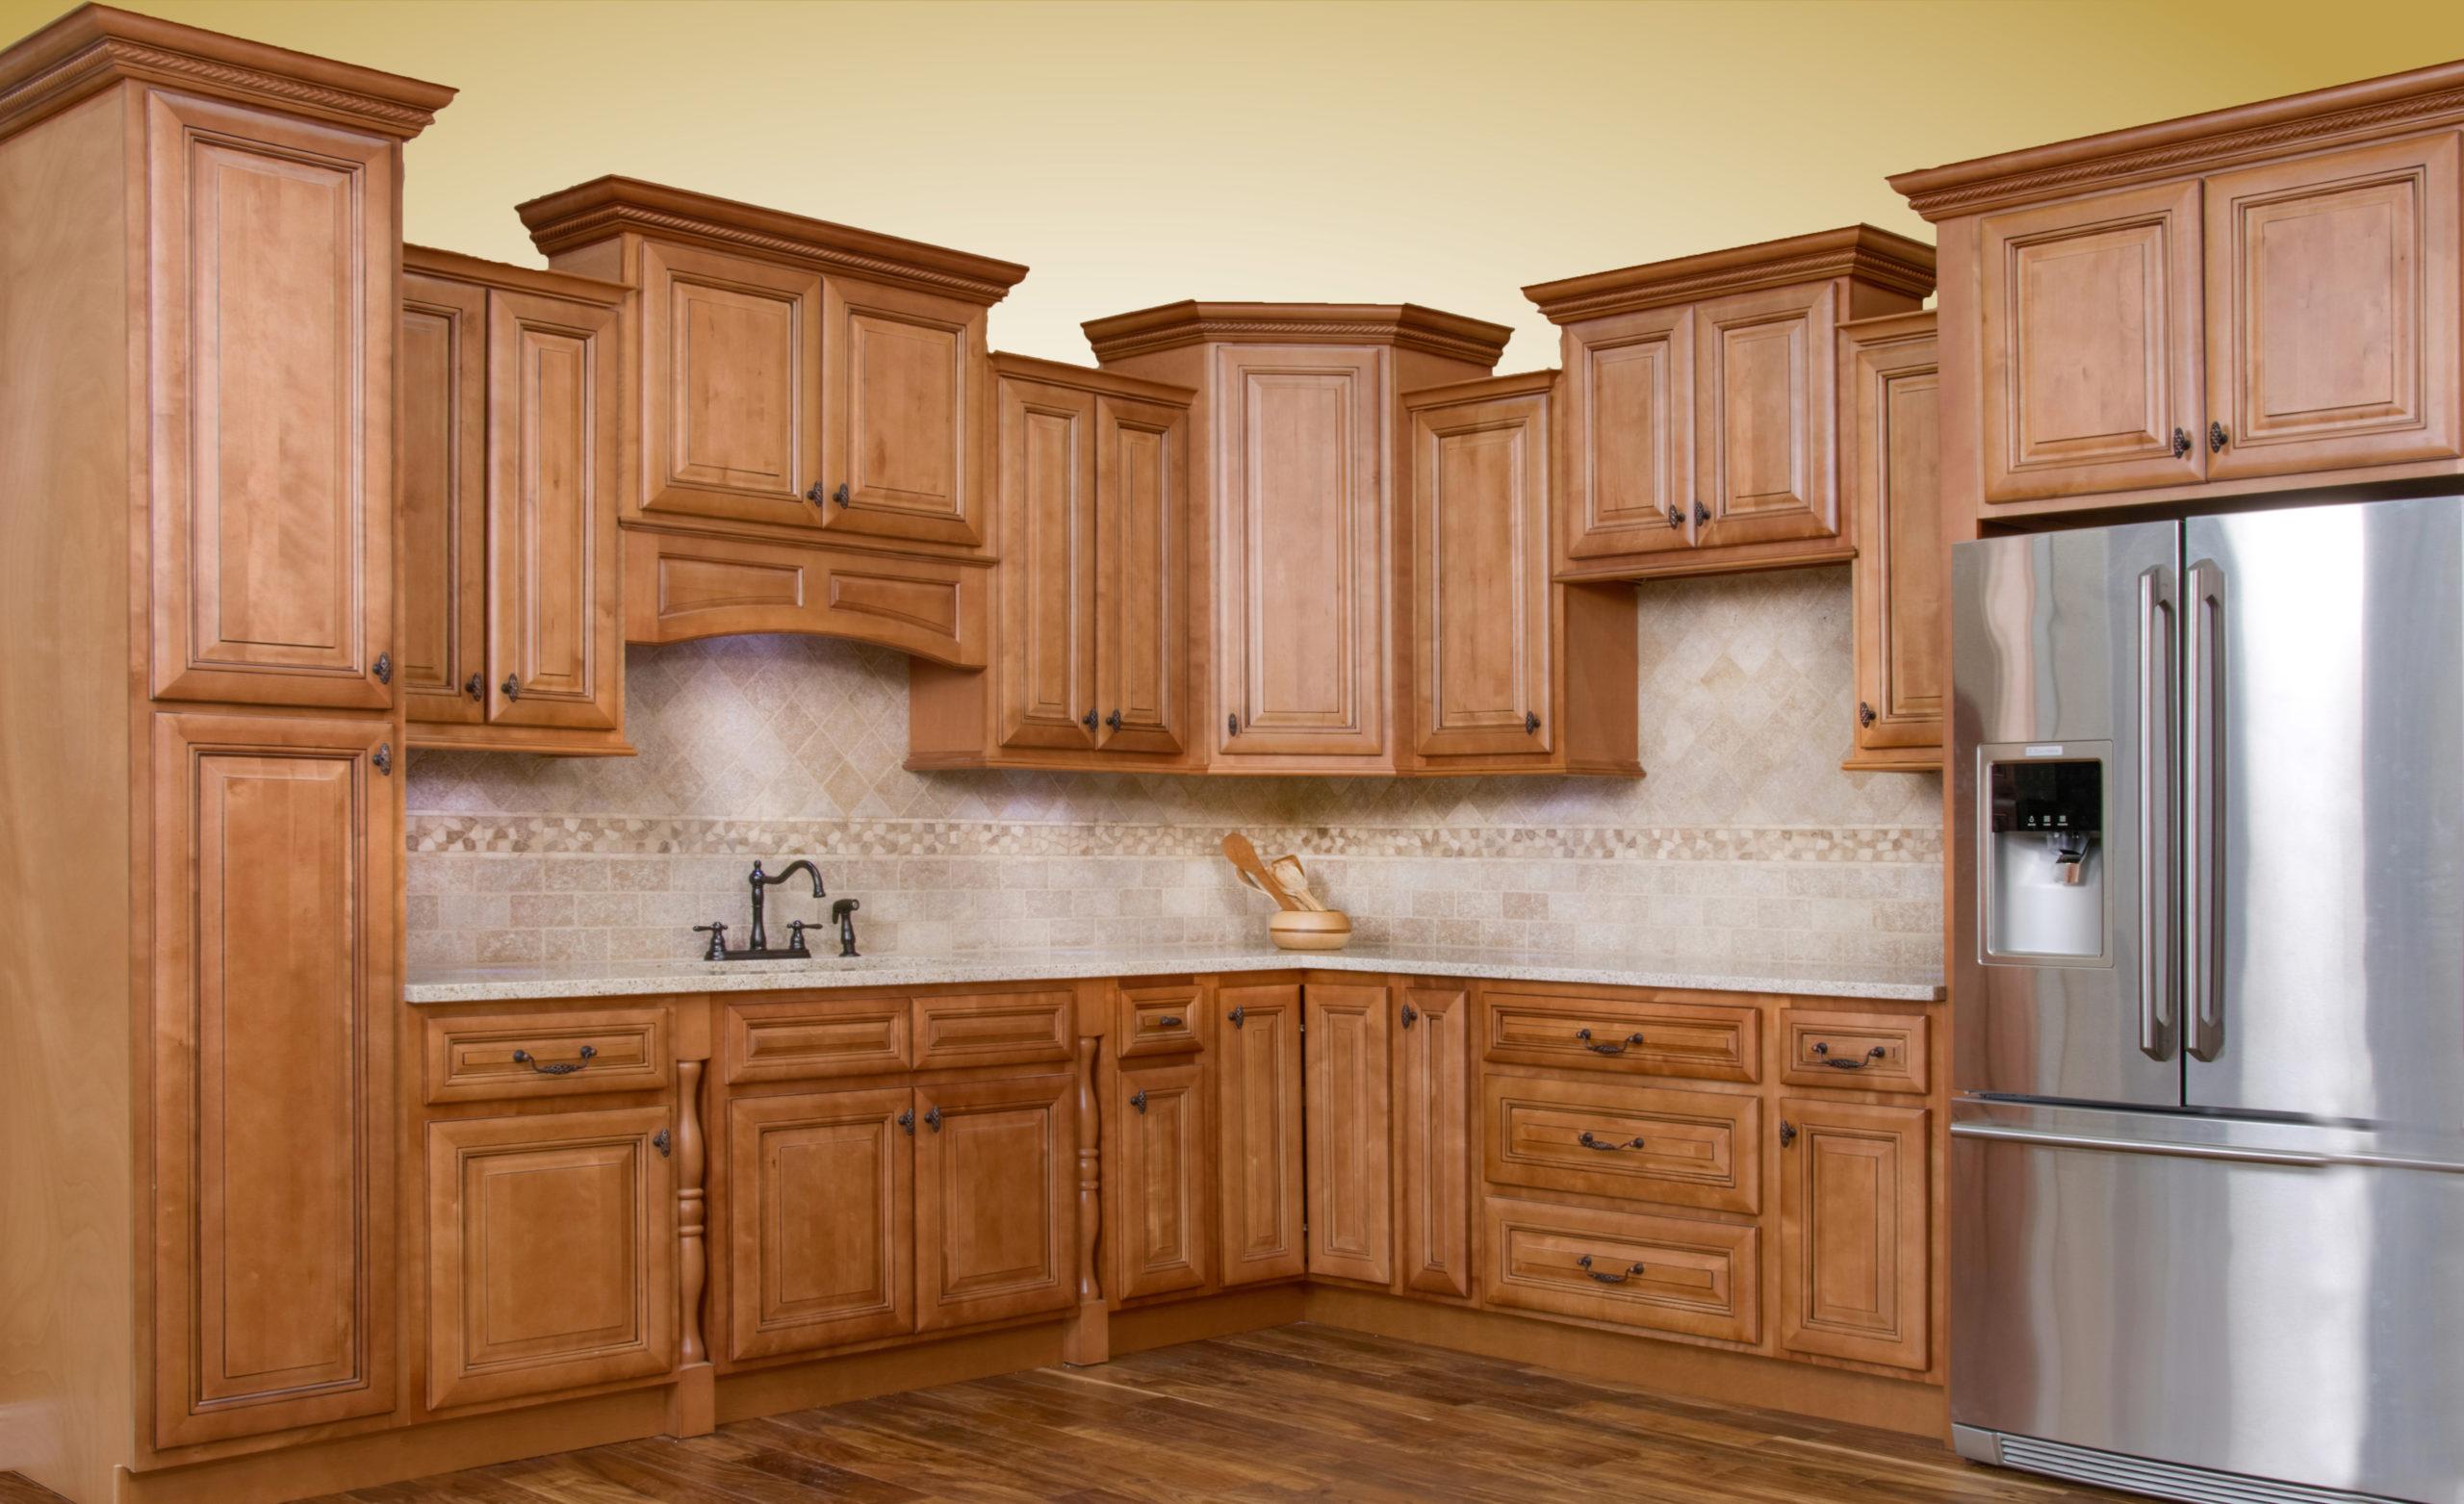 Savannah Sienna Glaze Cabinets - Choose Your Floors